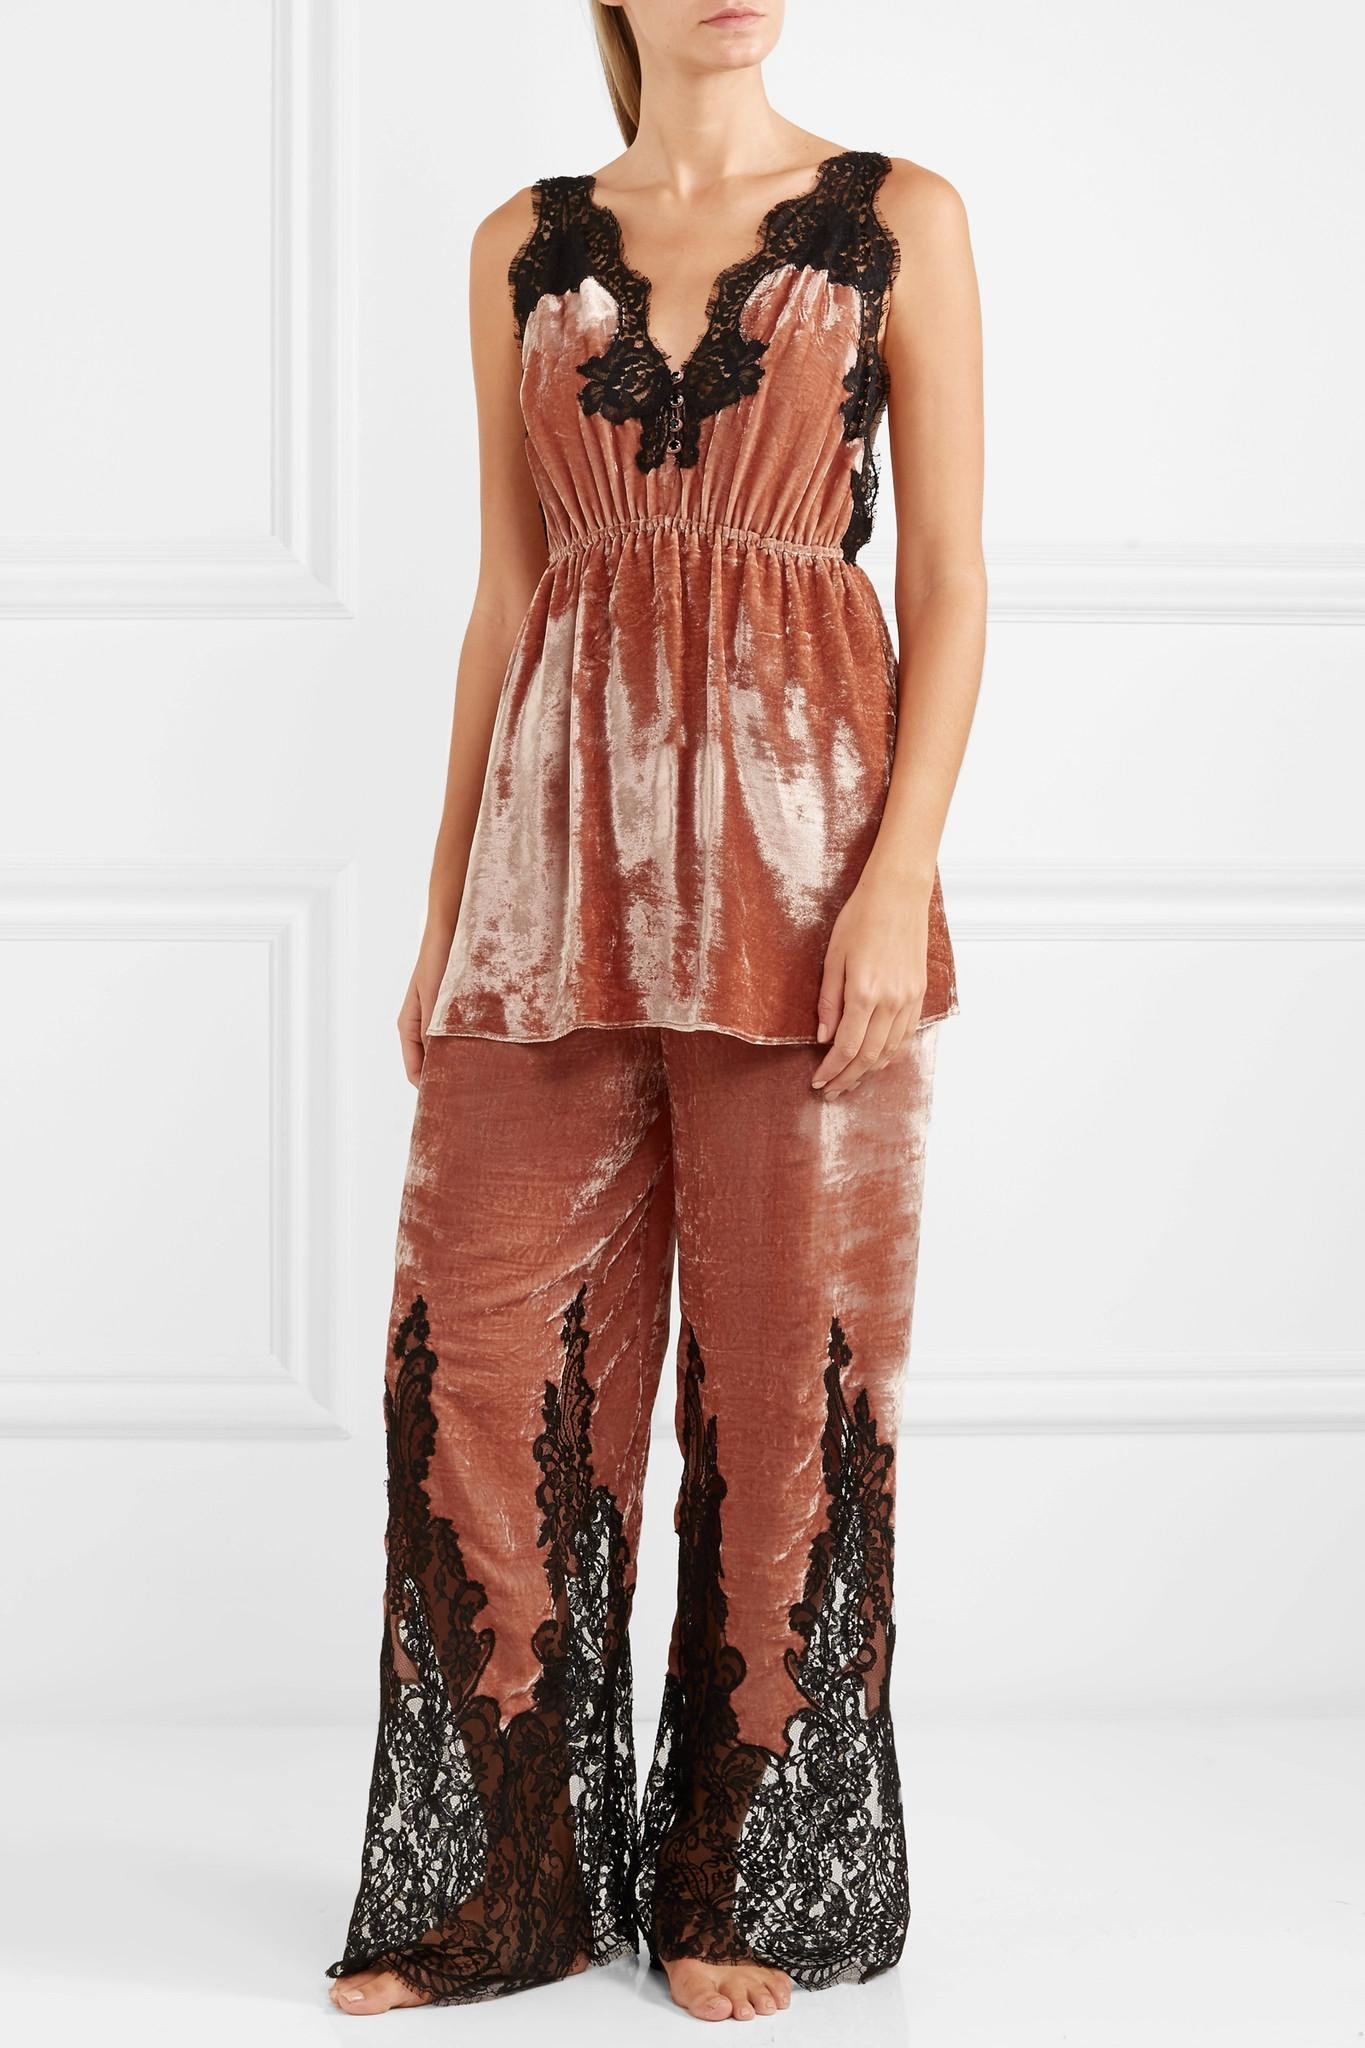 Lyst - Rosamosario Coprimi D amore Lace-paneled Silk-velvet Pajama Pants 5a80b3b1d